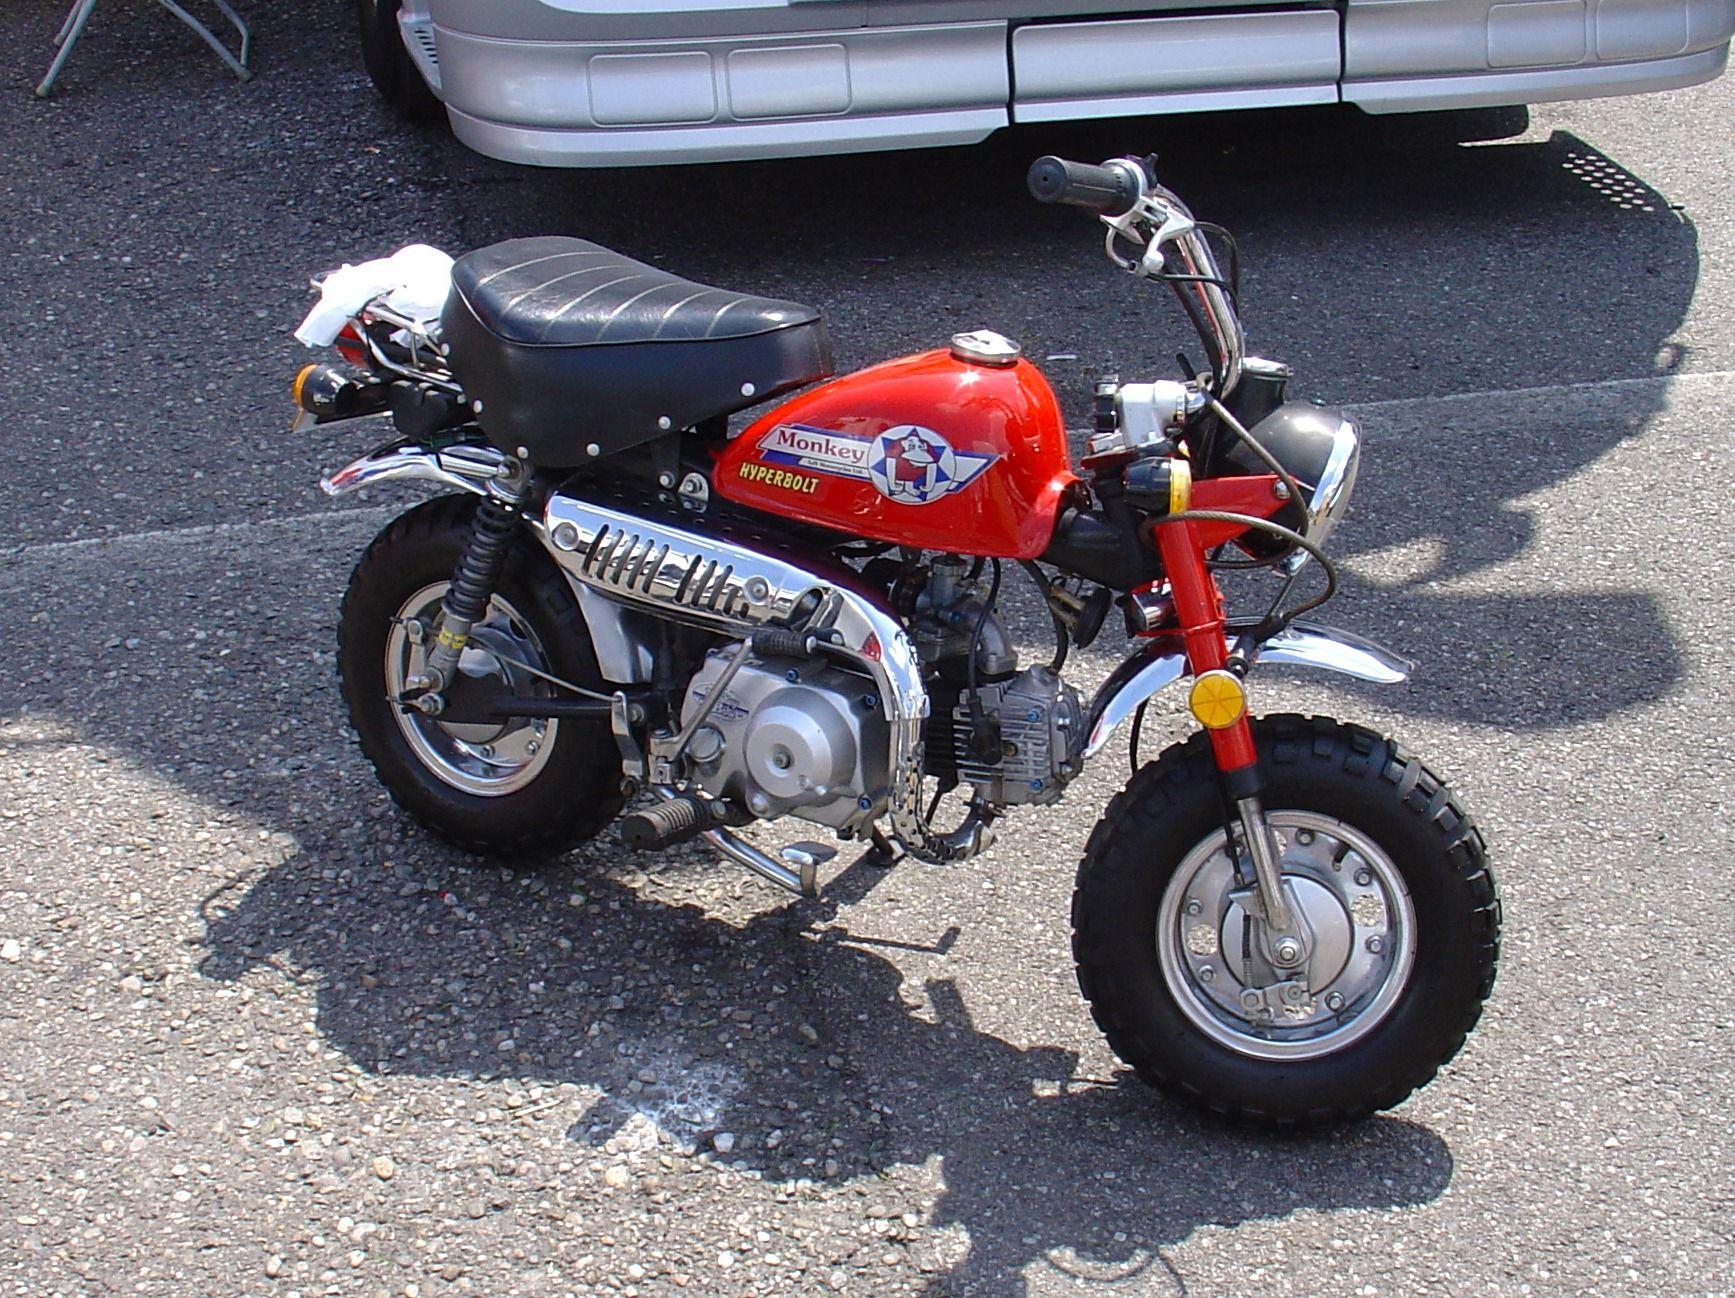 Jincheng Monkey Bike At Monza In 2007